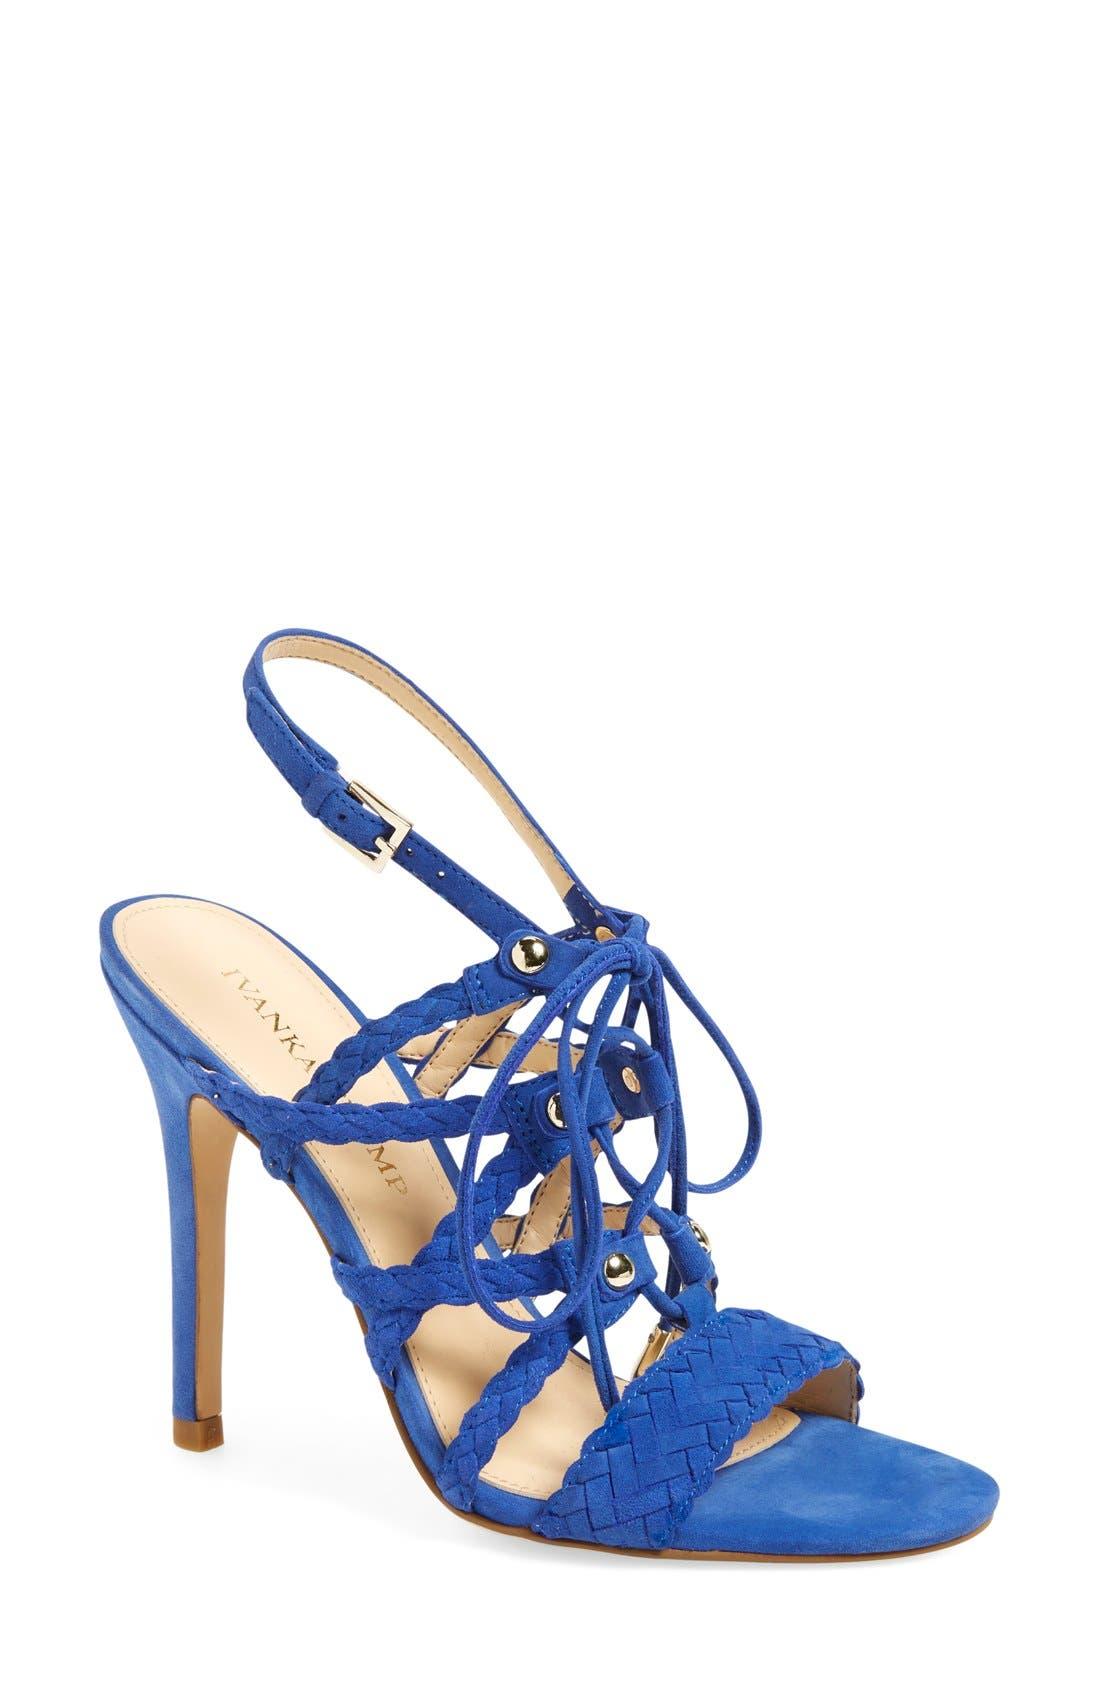 Main Image - Ivanka Trump 'Hera' Sandal (Women)